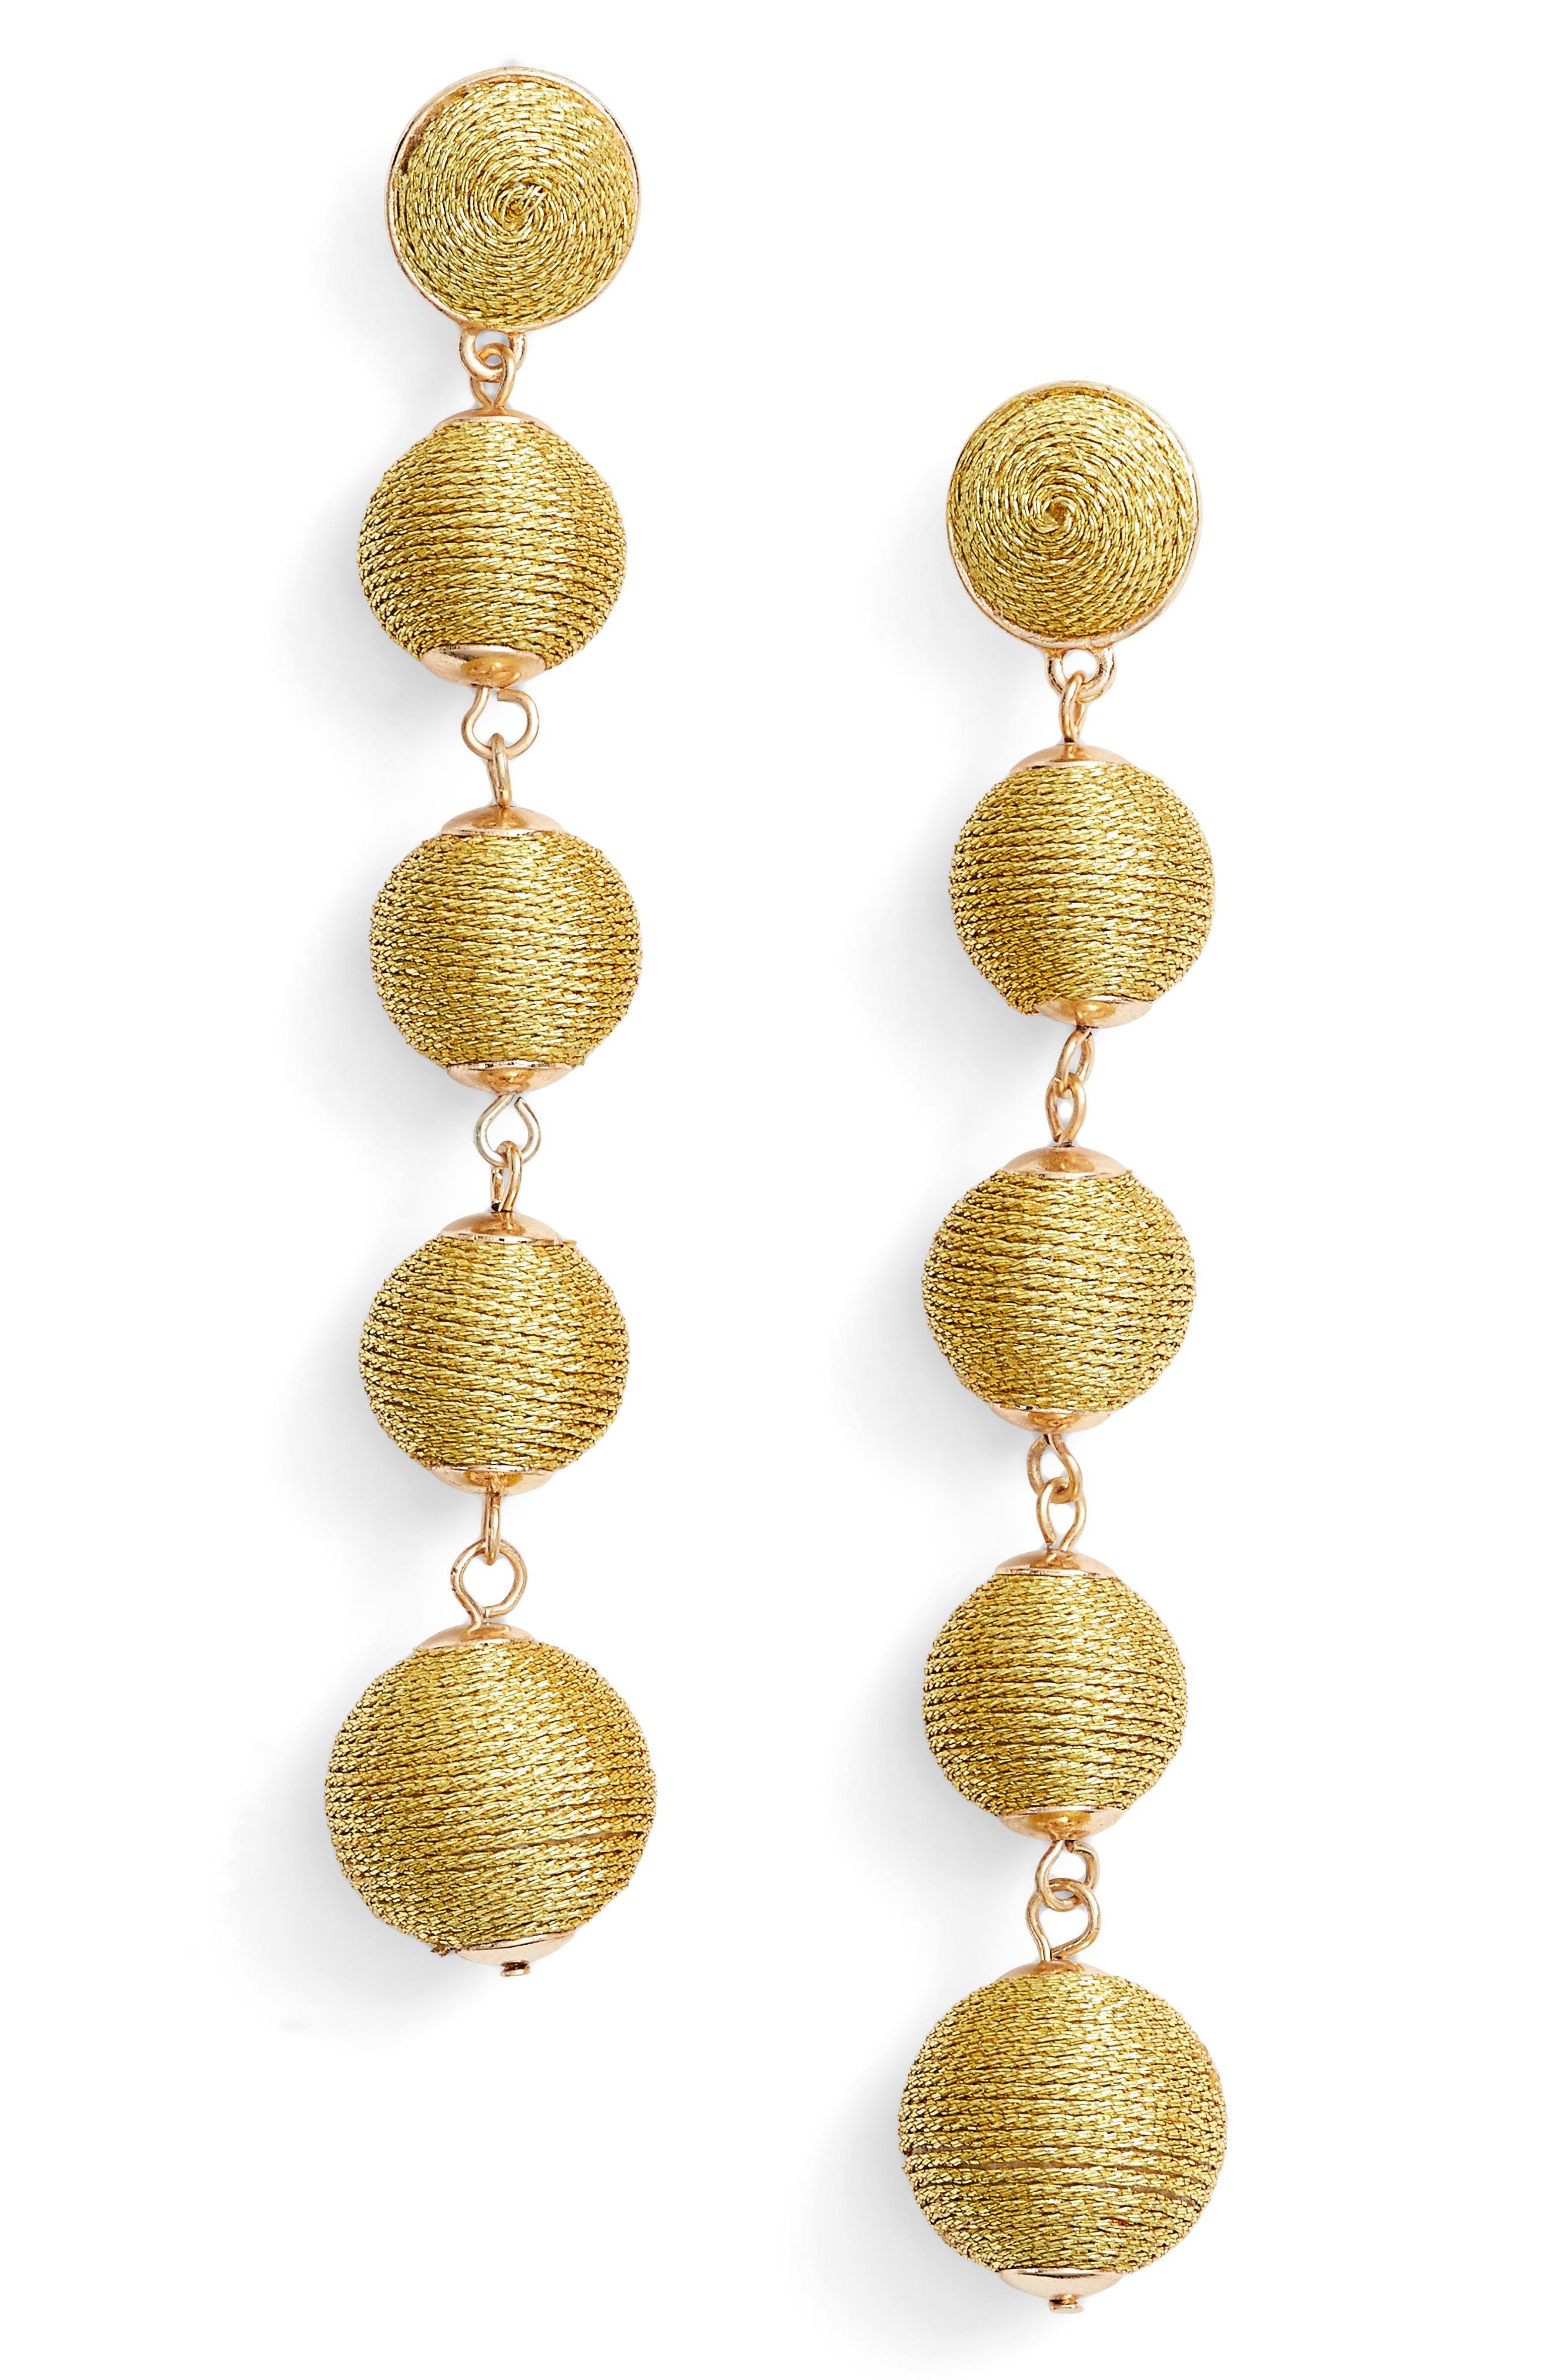 Alternate Image 1 Selected - Baublebar Metallic Crispin Ball Statement Earrings